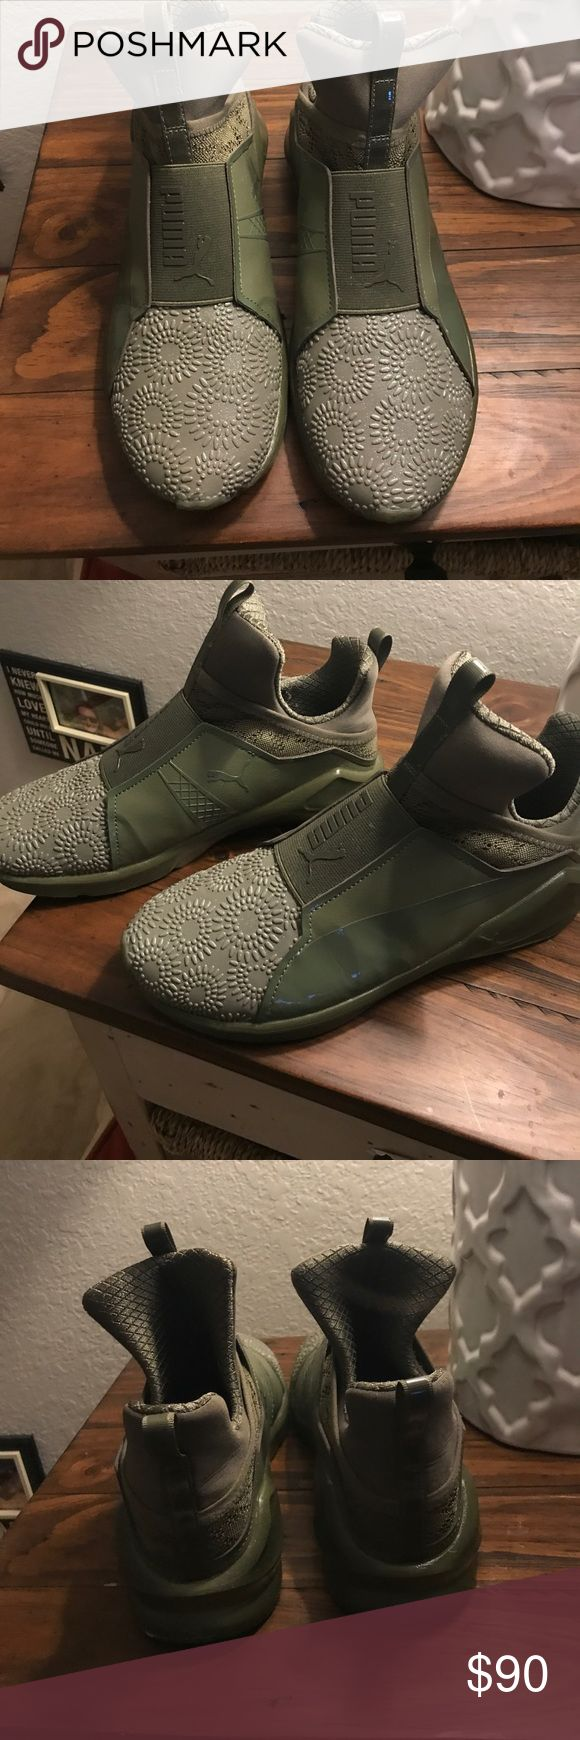 Selling this Army Green Puma tennis shoes on Poshmark! My username is: meghanplys. #shopmycloset #poshmark #fashion #shopping #style #forsale #Puma #Shoes